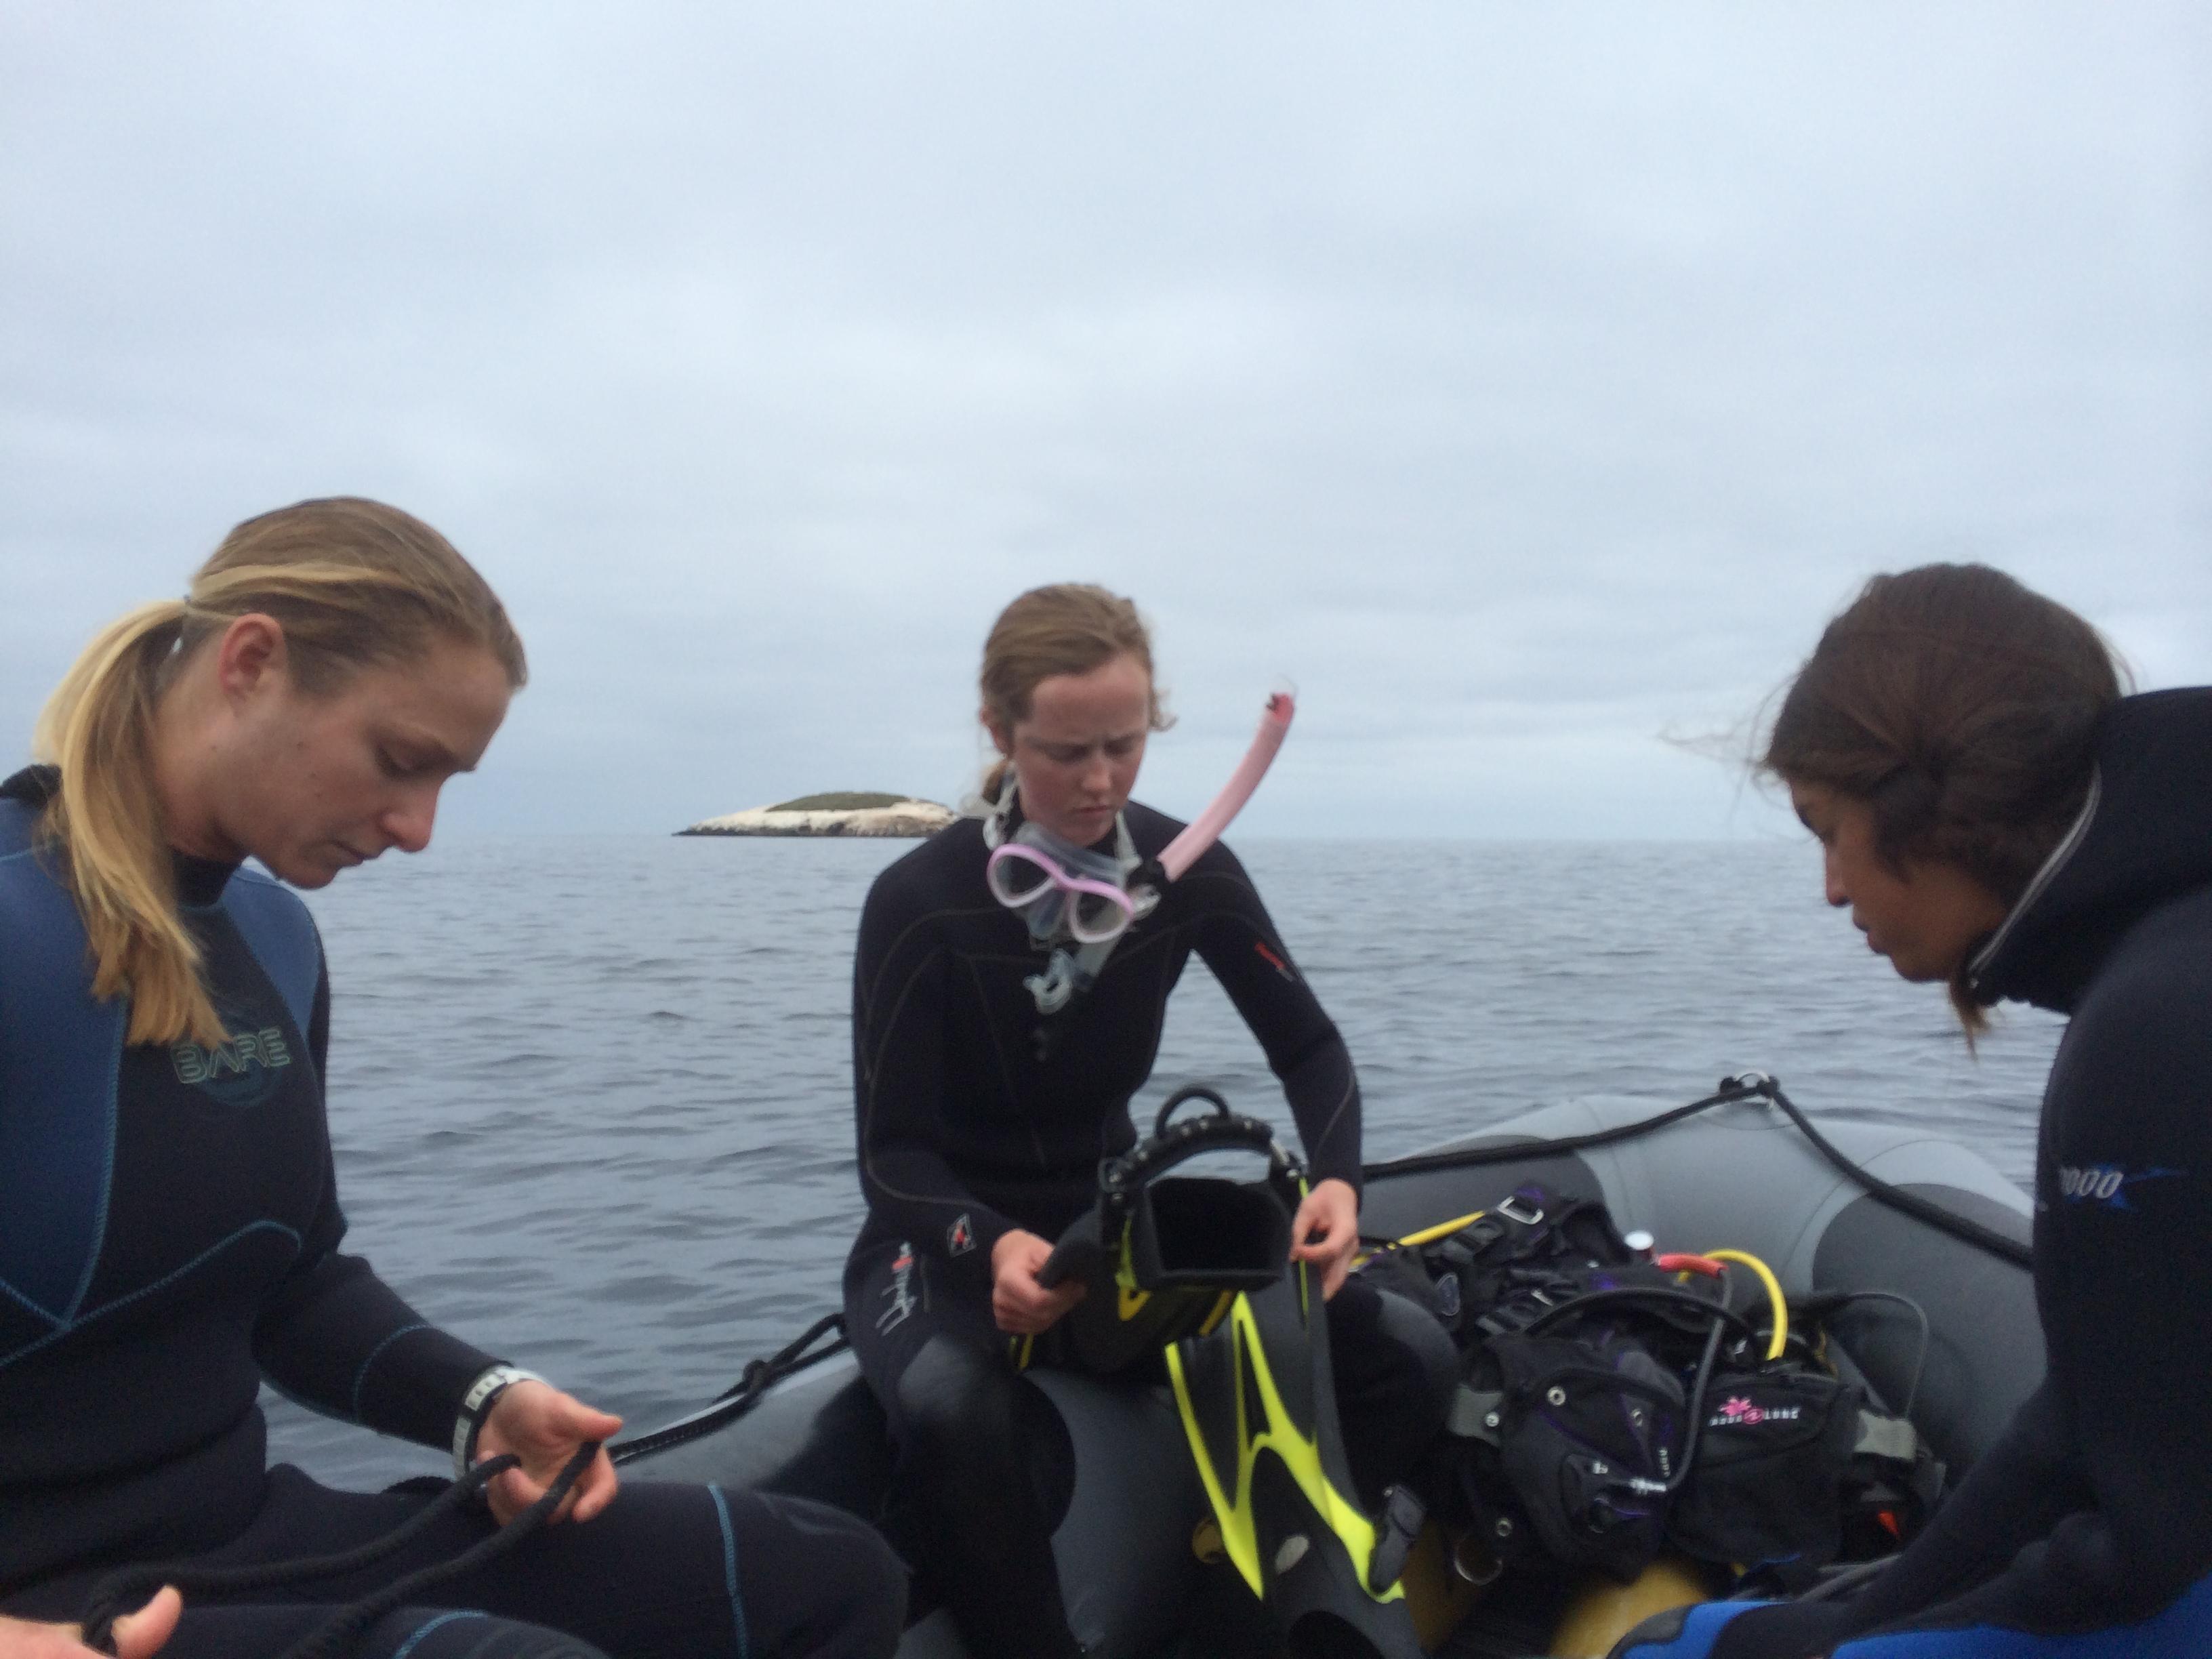 MLEL divers in boat.